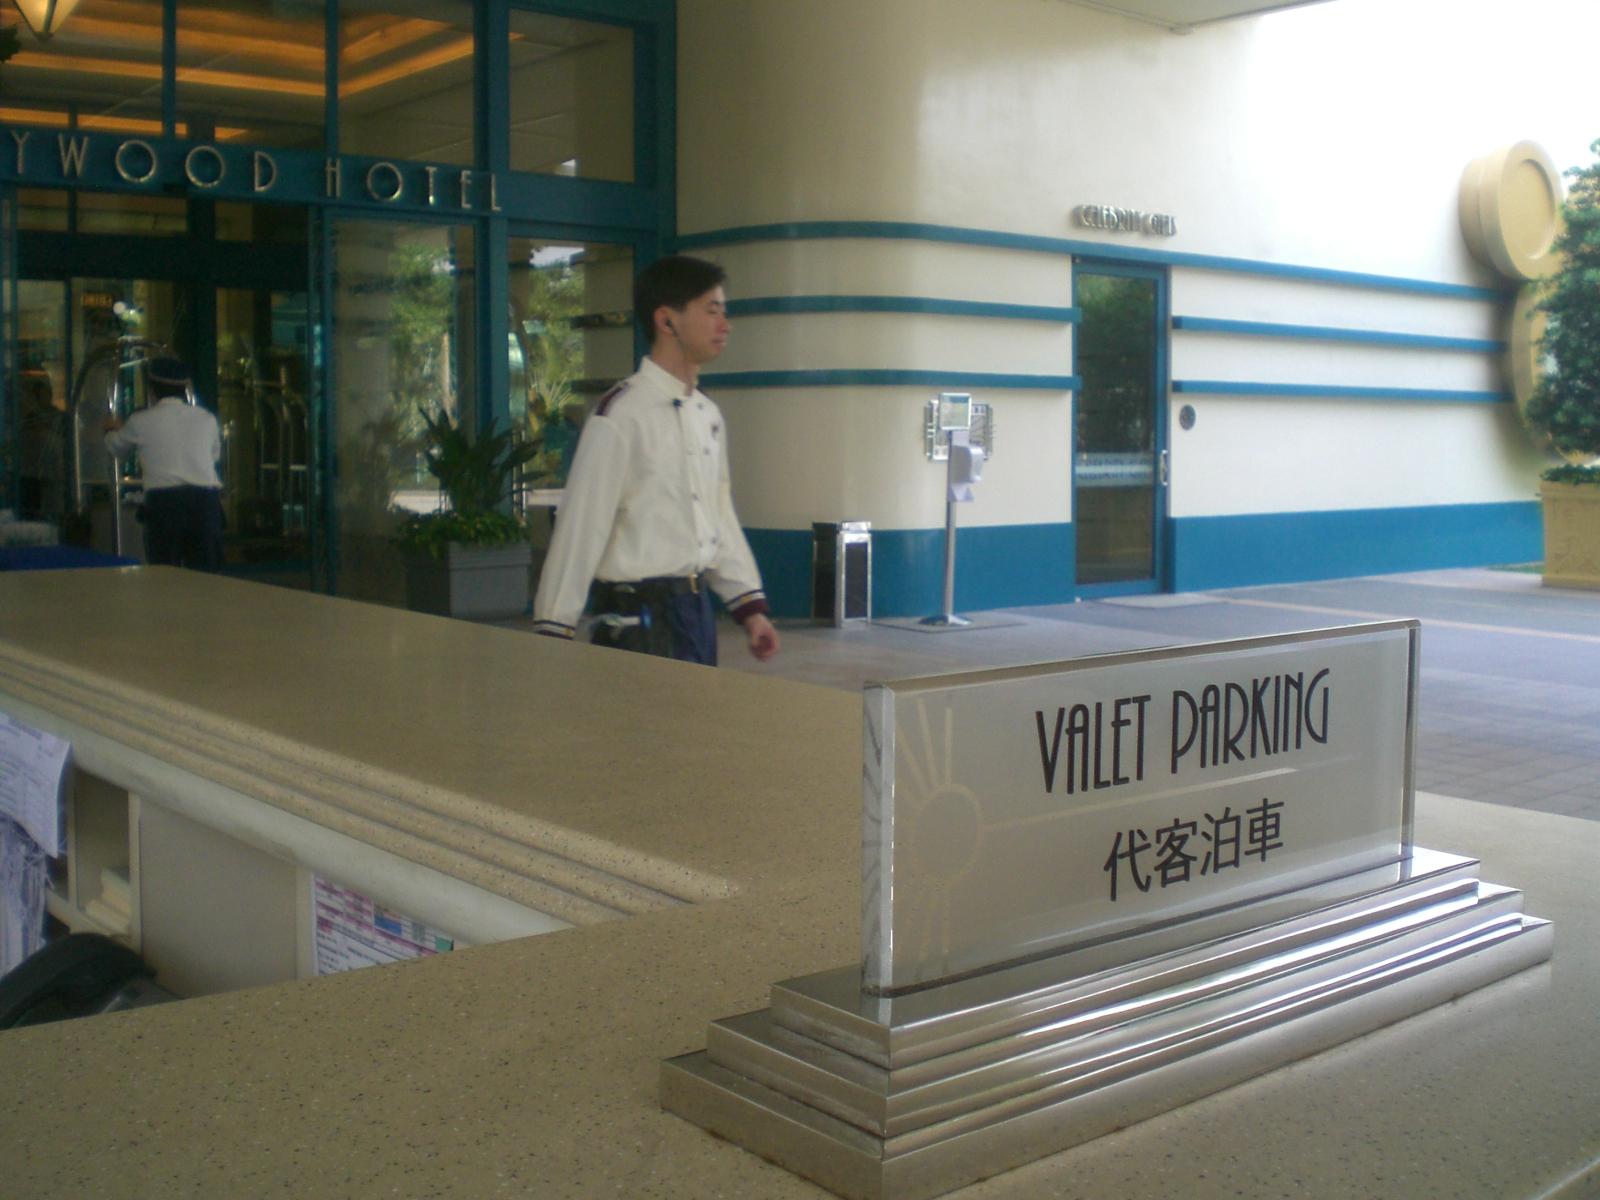 Is Your Car Safe At The Hotel Valet Parking Audi Stolen